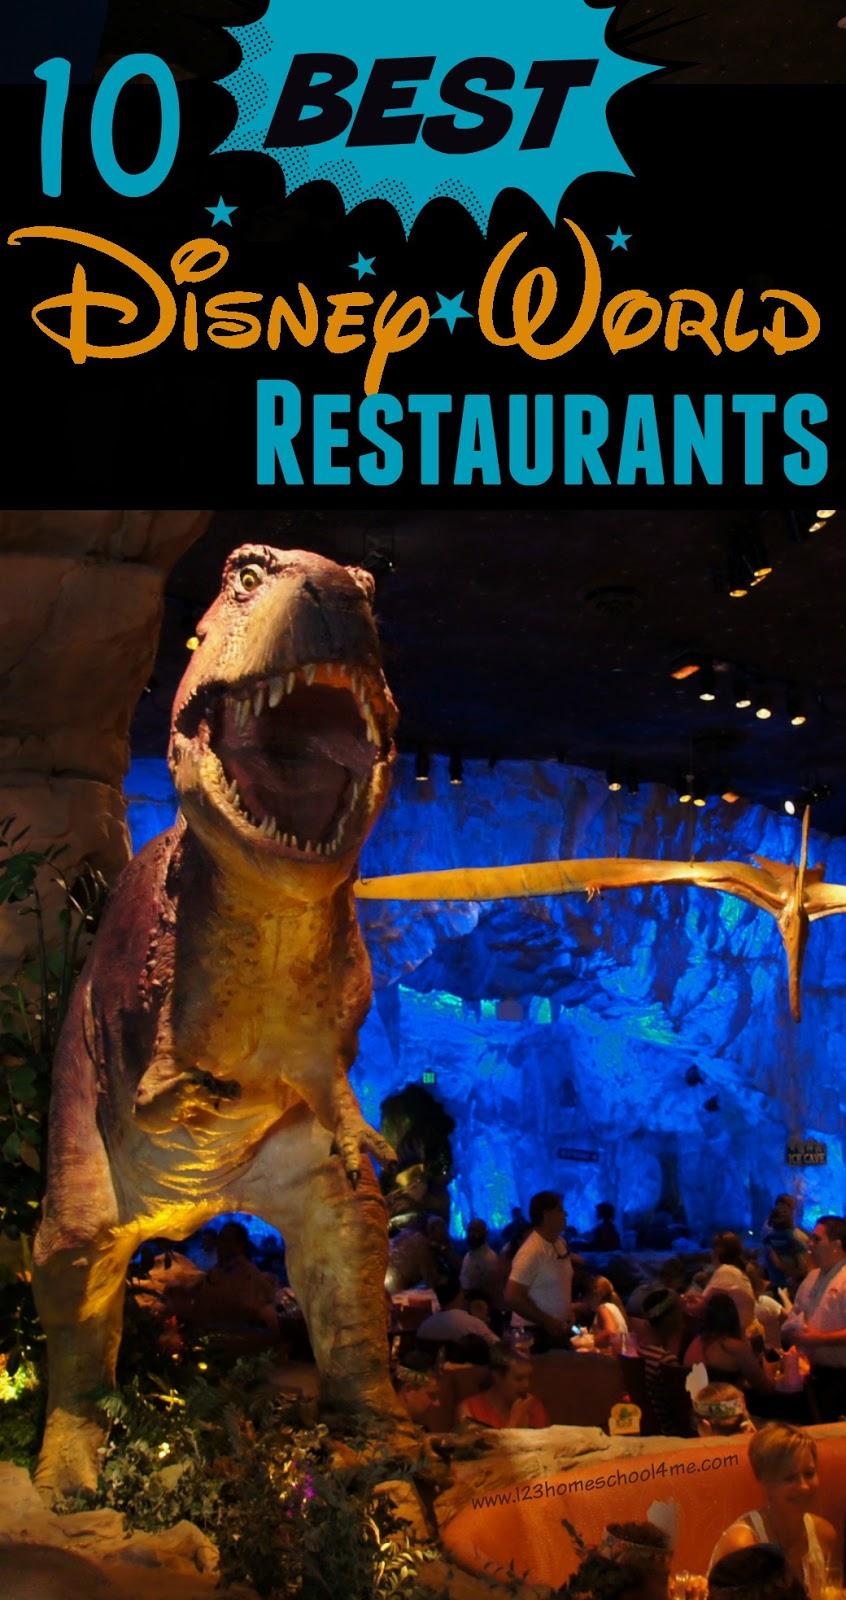 BEST Disney World Restaurants - Walt disney world table service restaurants